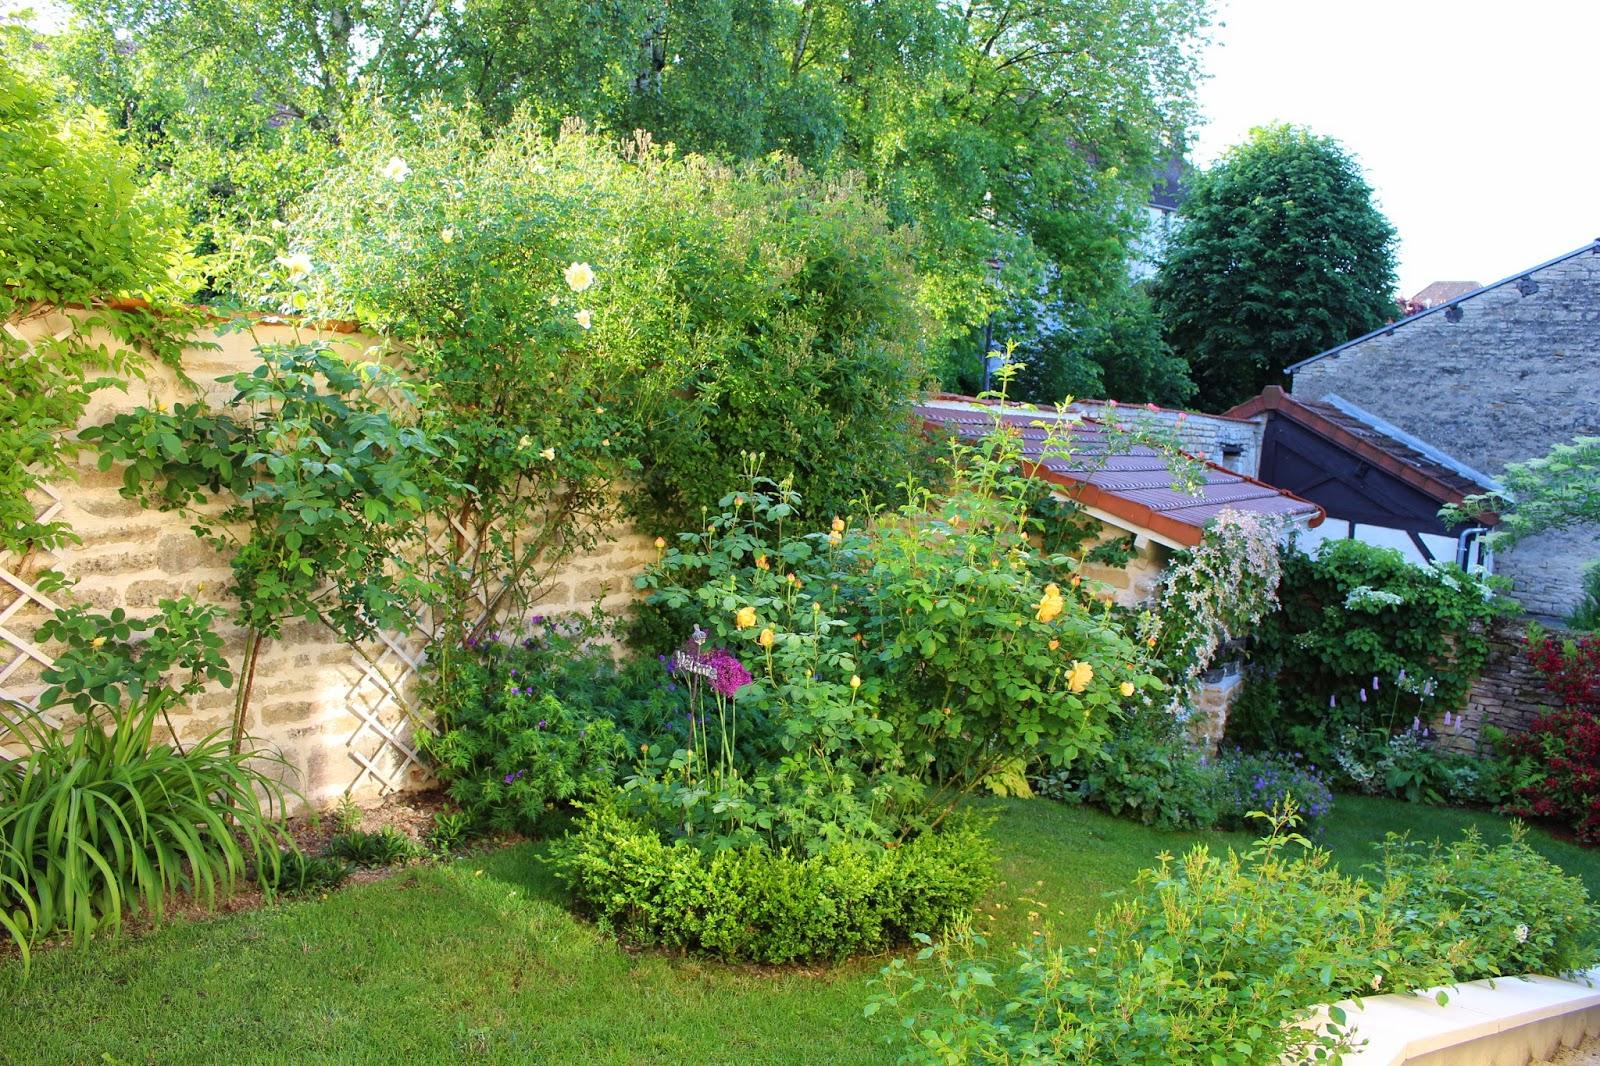 Notre jardin secret le jardin sous le regard d 39 olivier for Jardin secret 2015